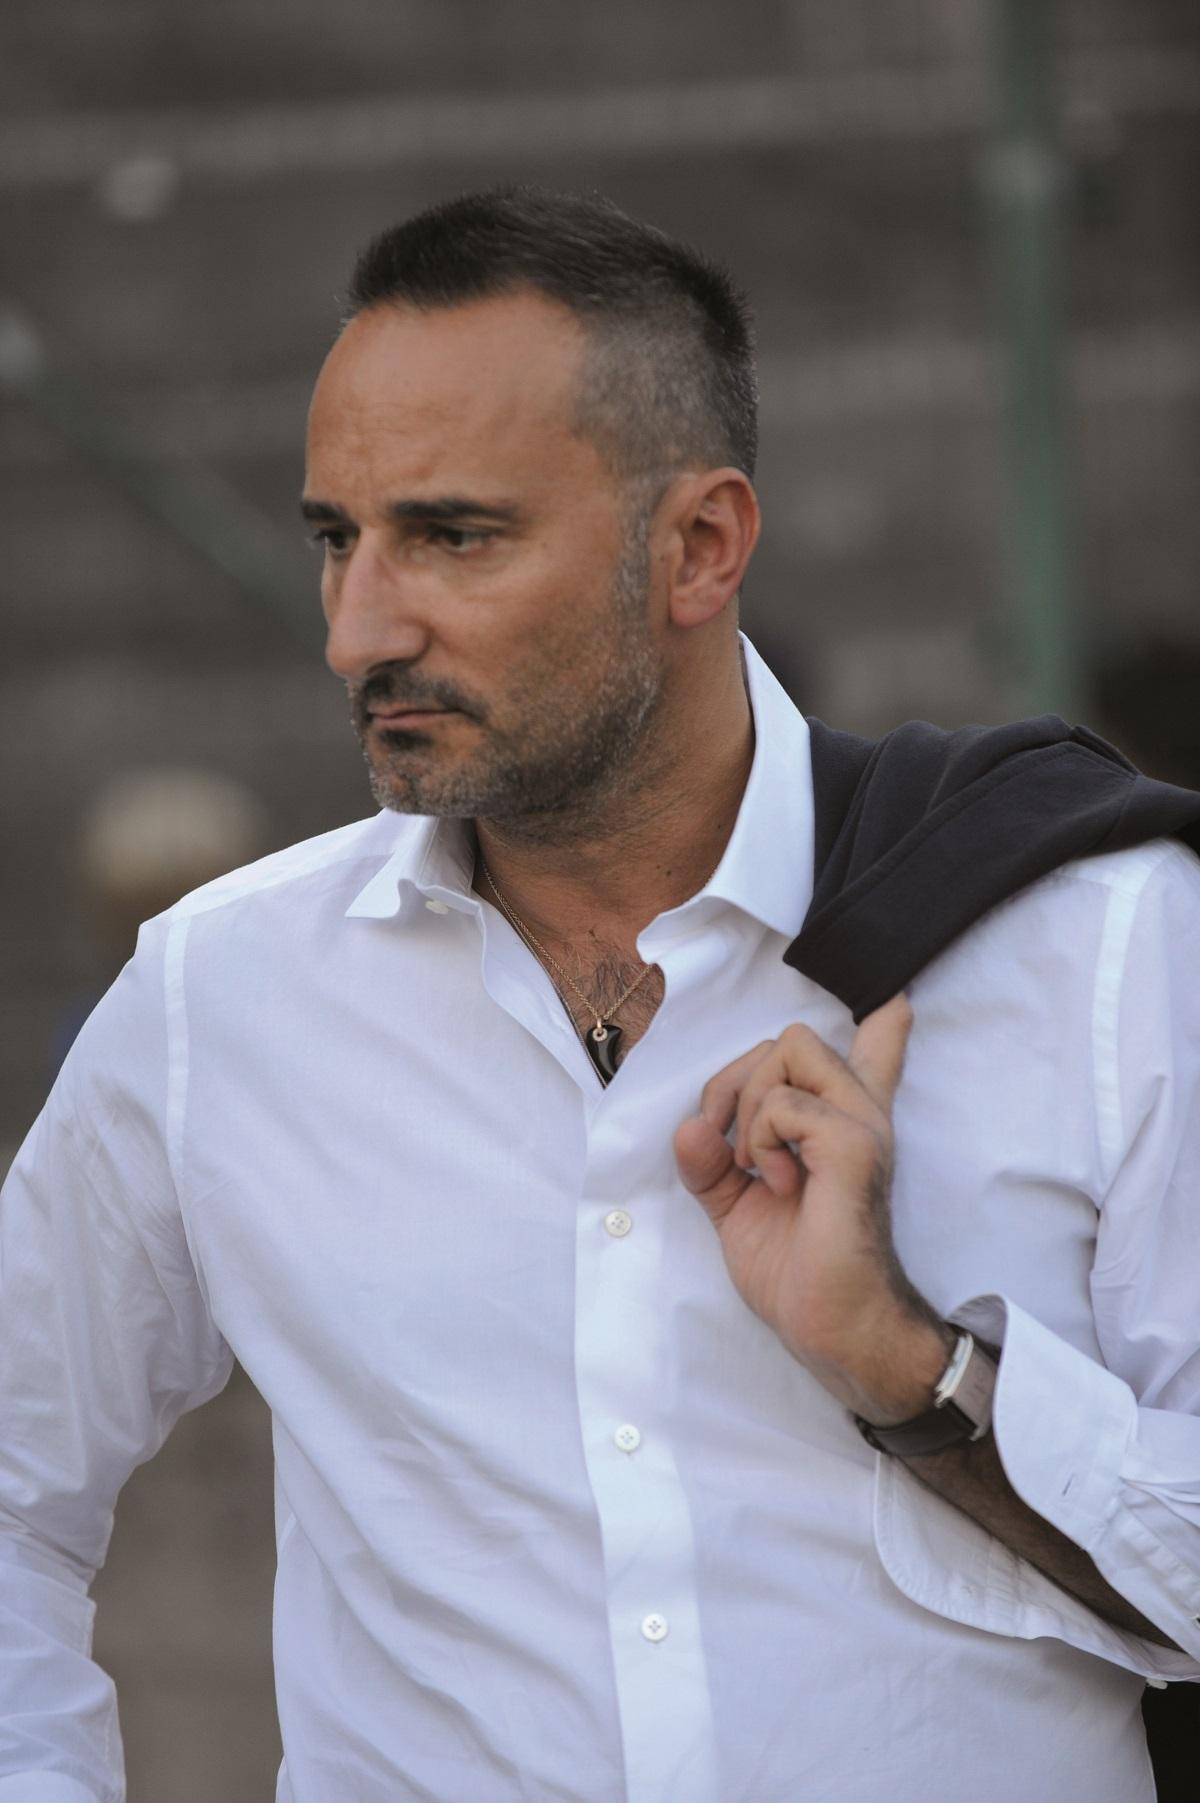 Maurizio-Setti-Ceo-Antress-Induustry-Spa1